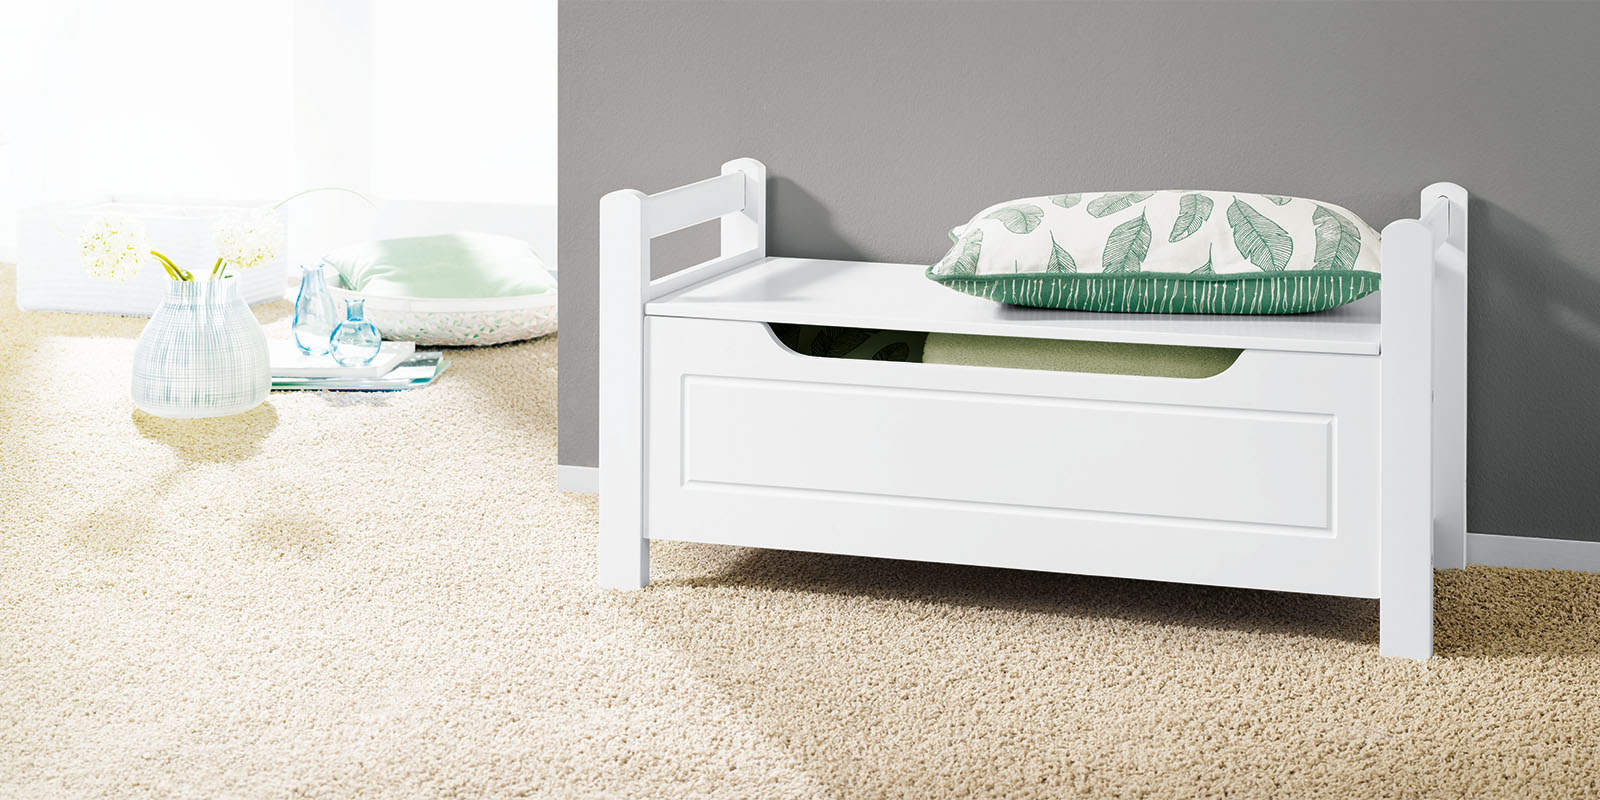 sitzbank mit klappdeckel wei 88x43x38 truhenbank holzbank. Black Bedroom Furniture Sets. Home Design Ideas